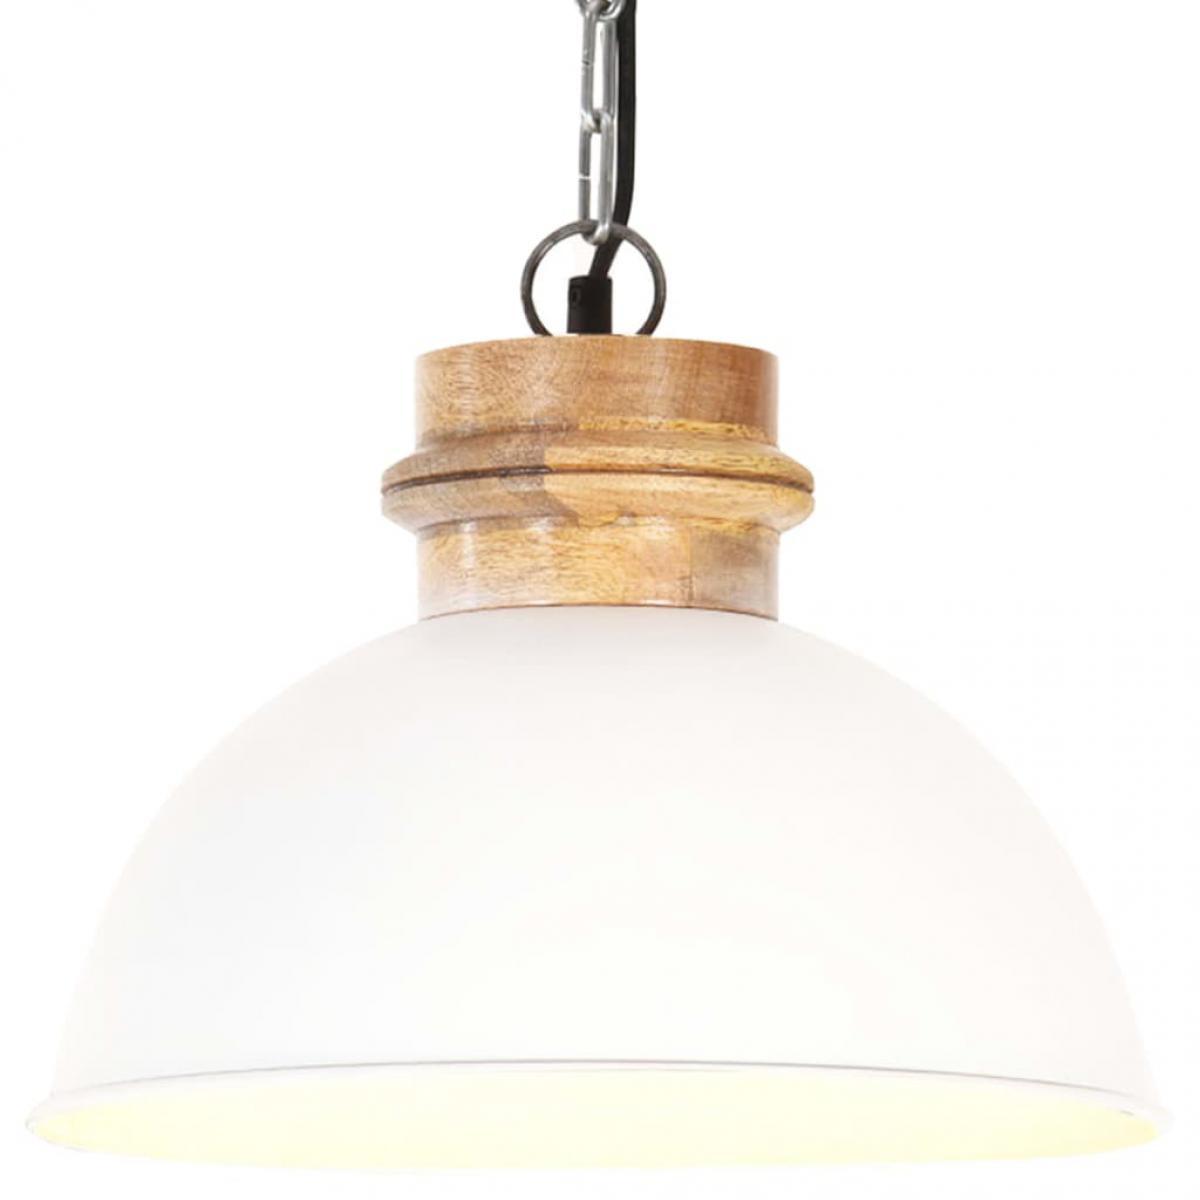 Vidaxl vidaXL Lampe suspendue industrielle Blanc Rond 32 cm E27 Manguier